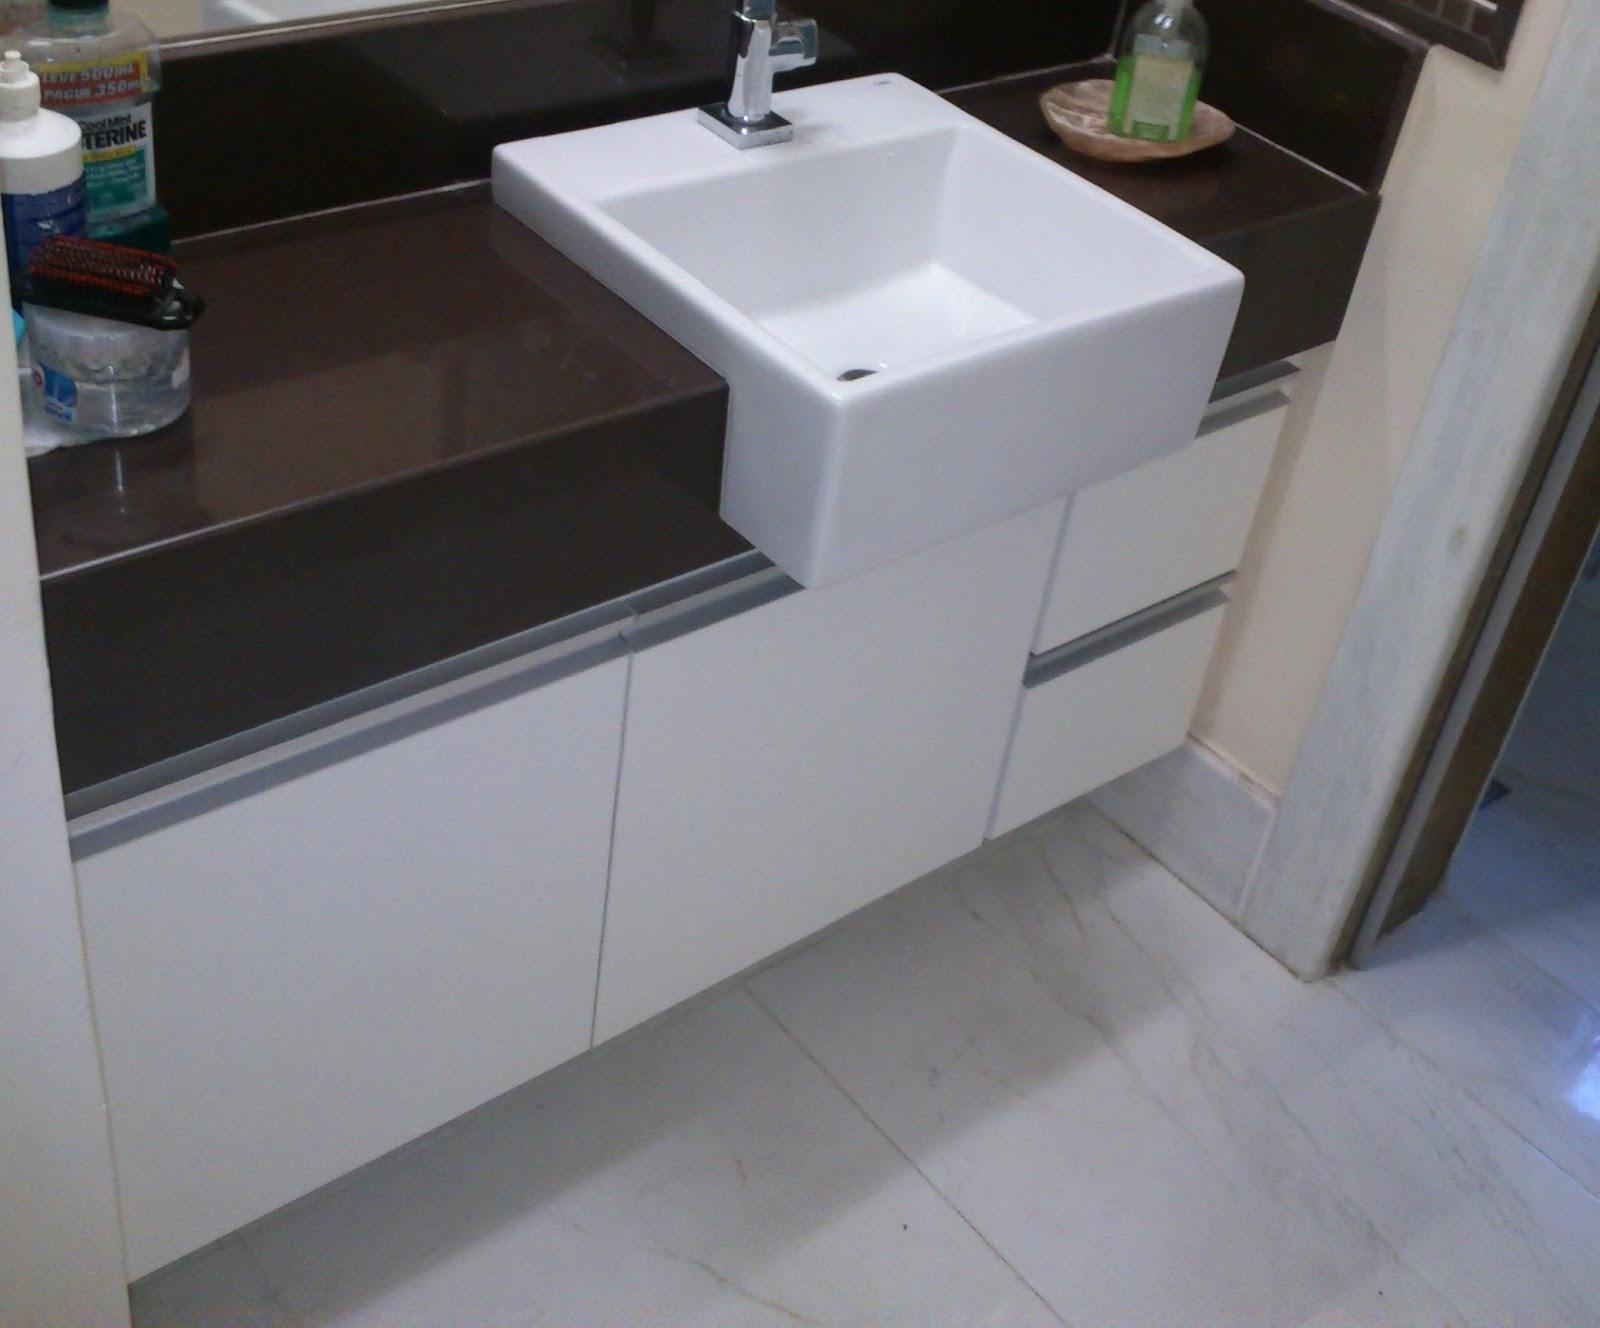 Lopes arm rios planejados arm rio para lavabo padr o branco portas em 18mm corredi as - Perfiles de aluminio para armarios ...